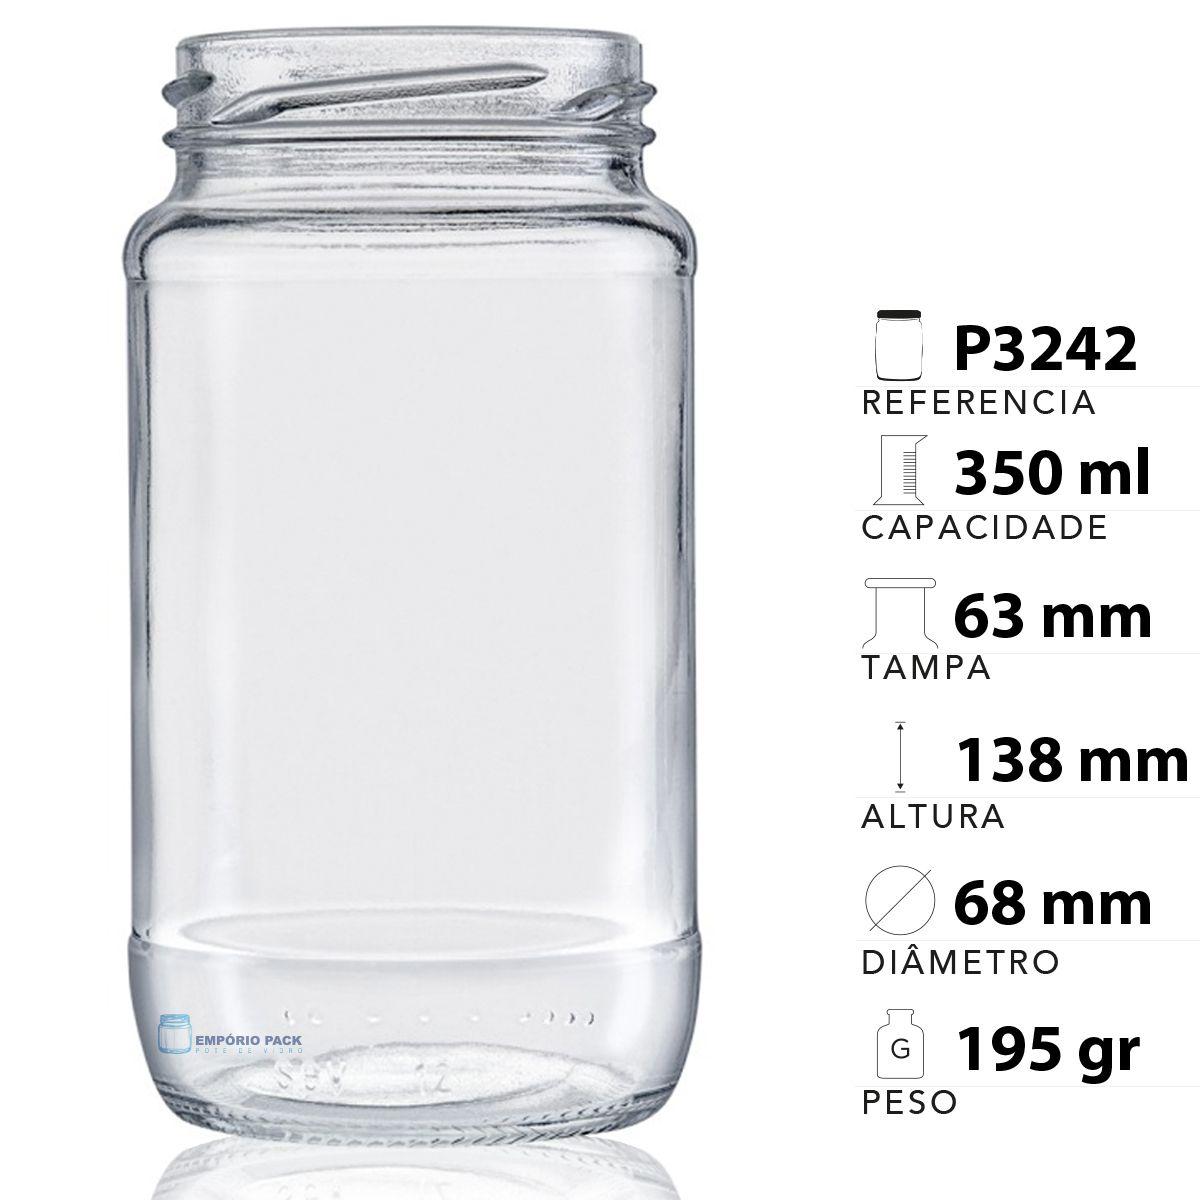 44 Potes De Vidro Azeitona 355 Ml Com Tampa Branca + Lacre  - EMPÓRIO PACK